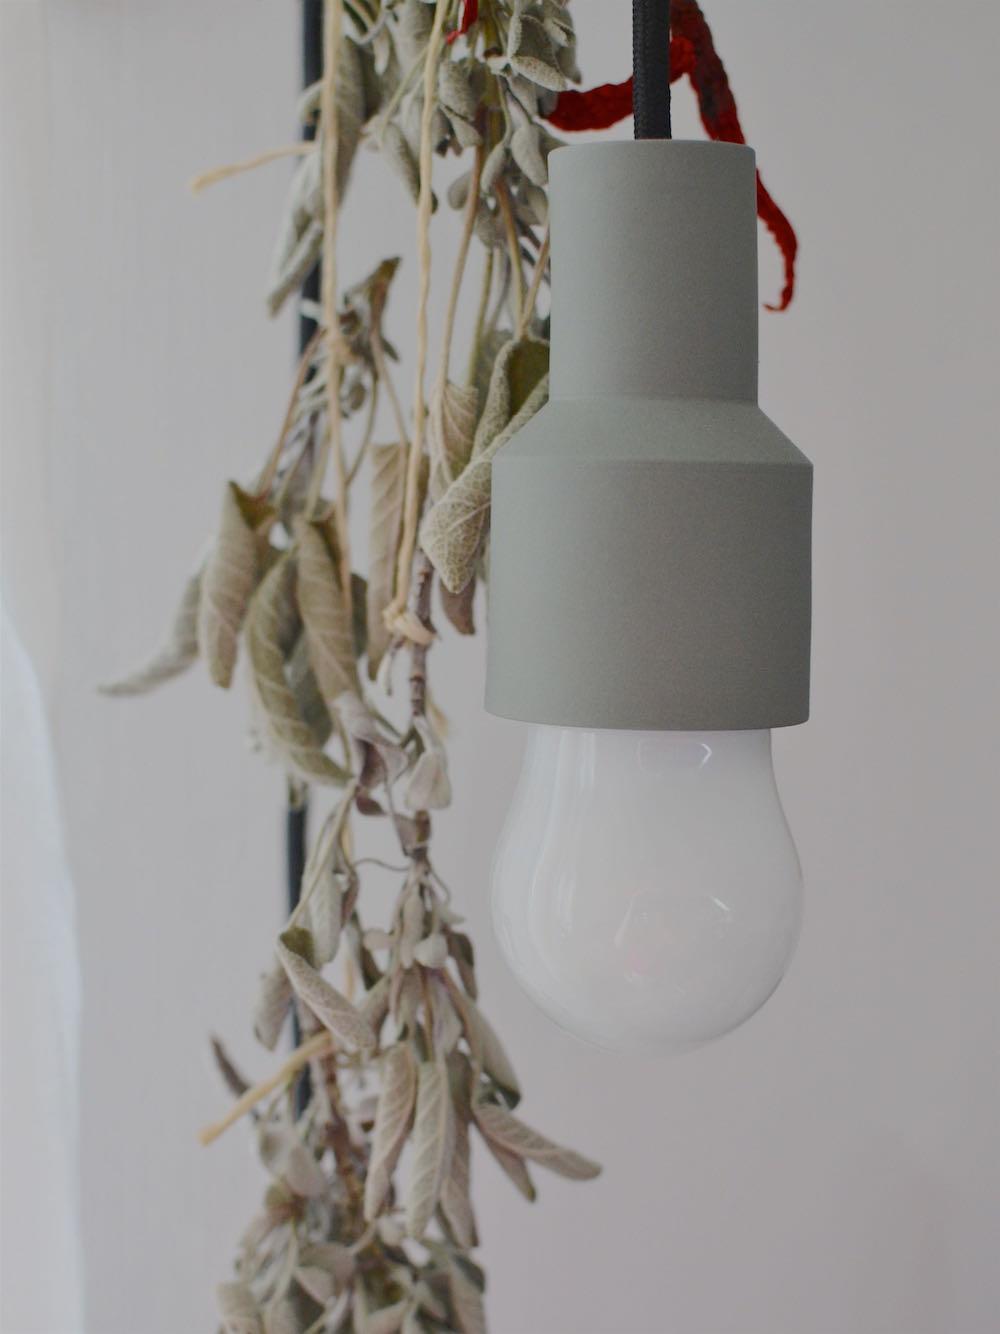 Lampe mit Textilkabel